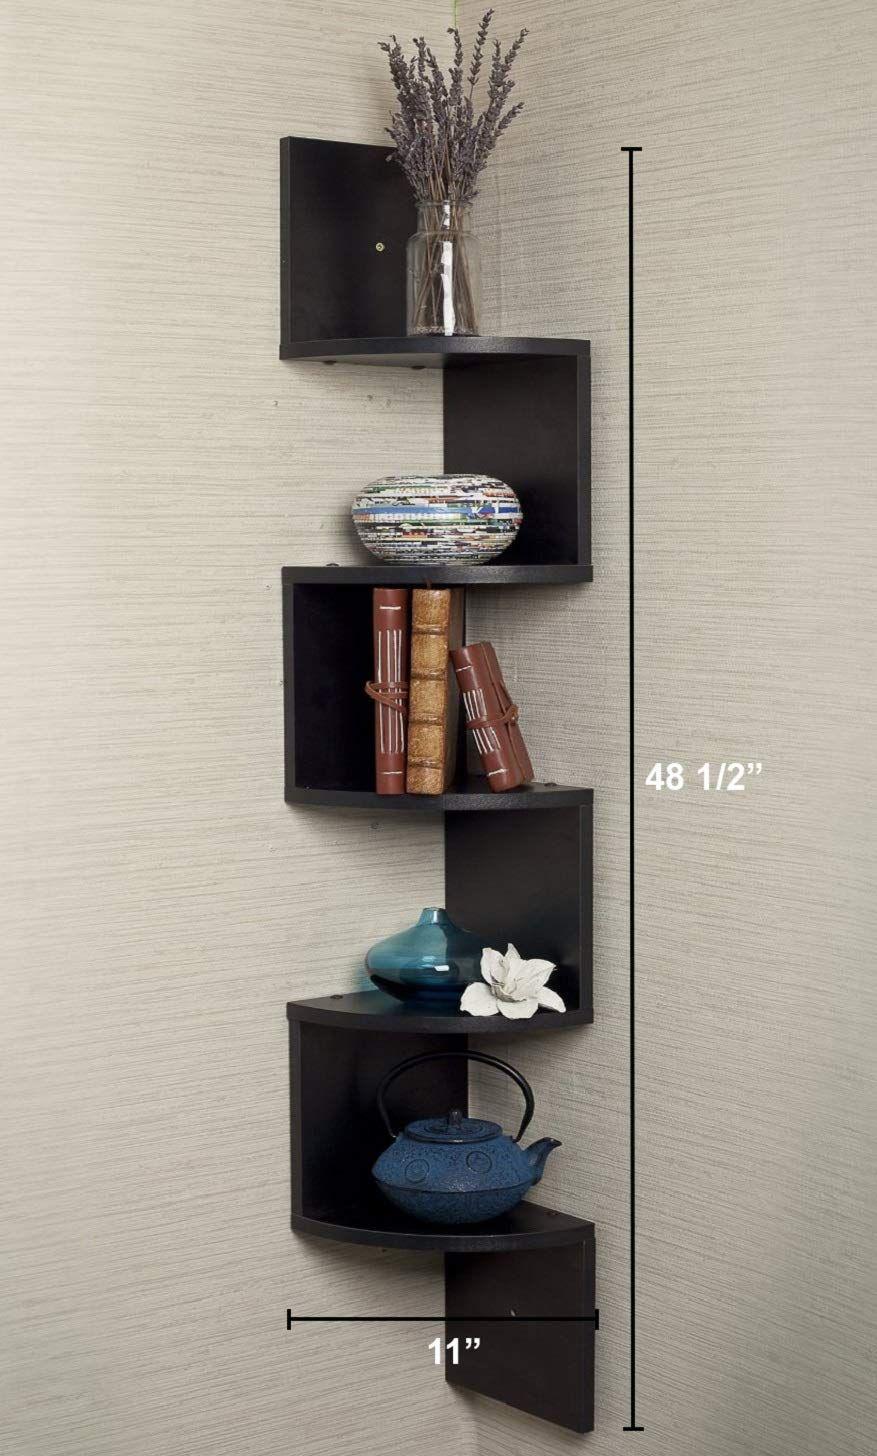 20 Best Floating Shelves That Instantly Free Up Space Storables In 2020 Wall Mounted Corner Shelves Corner Decor Corner Shelves